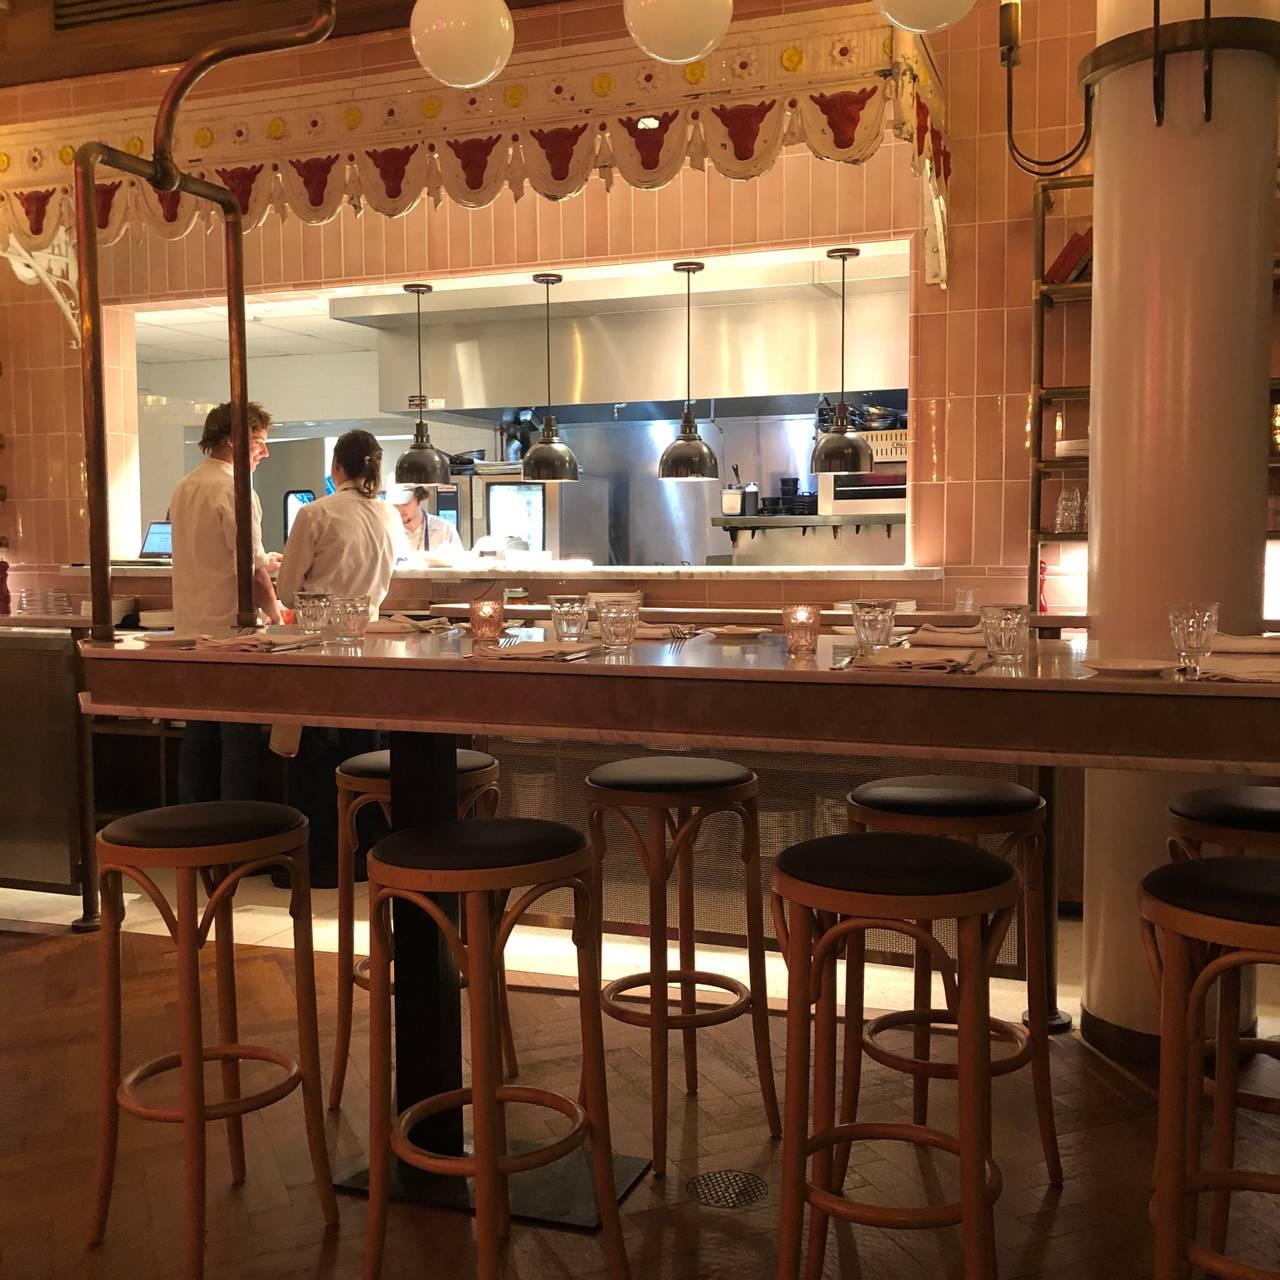 Maître D Oeuvre Orléans justine restaurant - new orleans, la | opentable